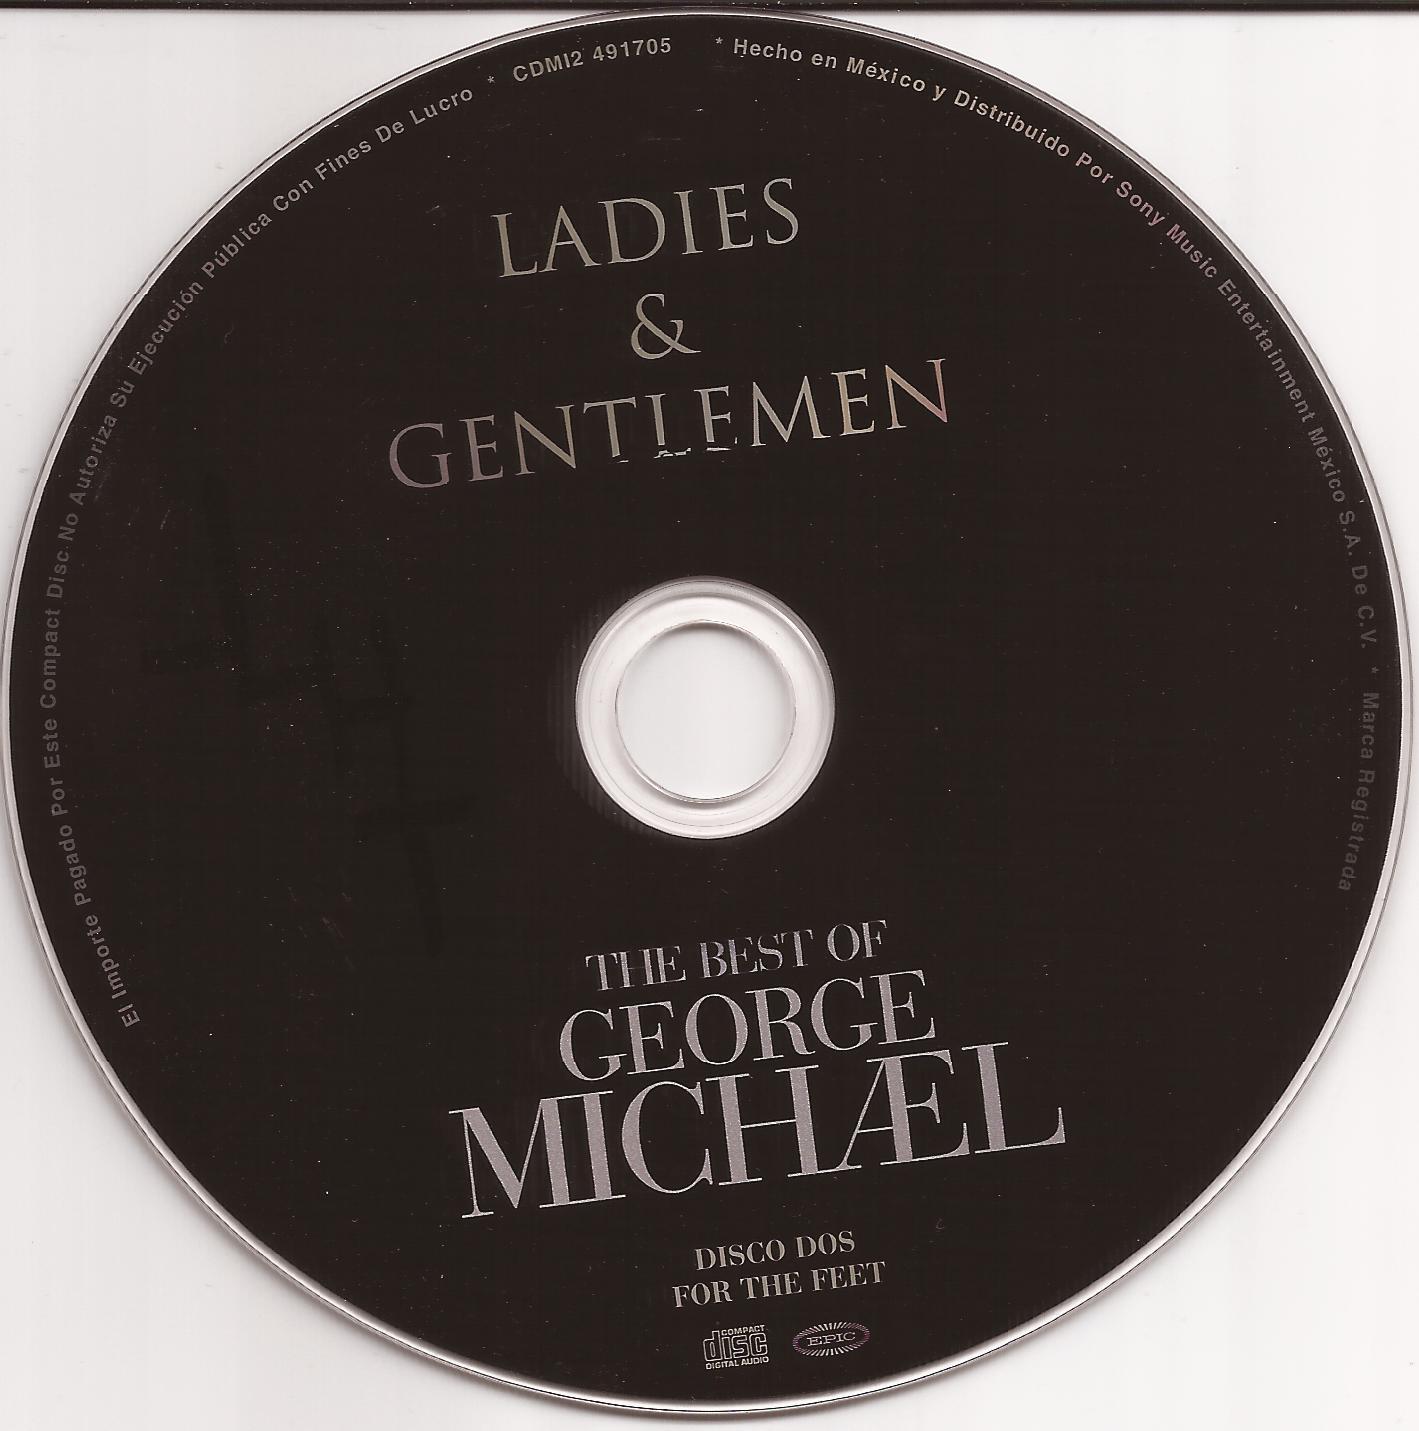 http://4.bp.blogspot.com/-K3mz6rMYVhg/T0WjRS0YyFI/AAAAAAAACEU/MRSaakHm-hw/s1600/Best+of+George+Michael+cd+2.jpg